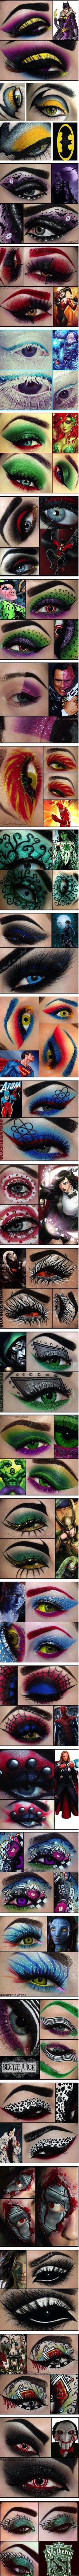 eye makeup-in superhero/villain style. Epic.